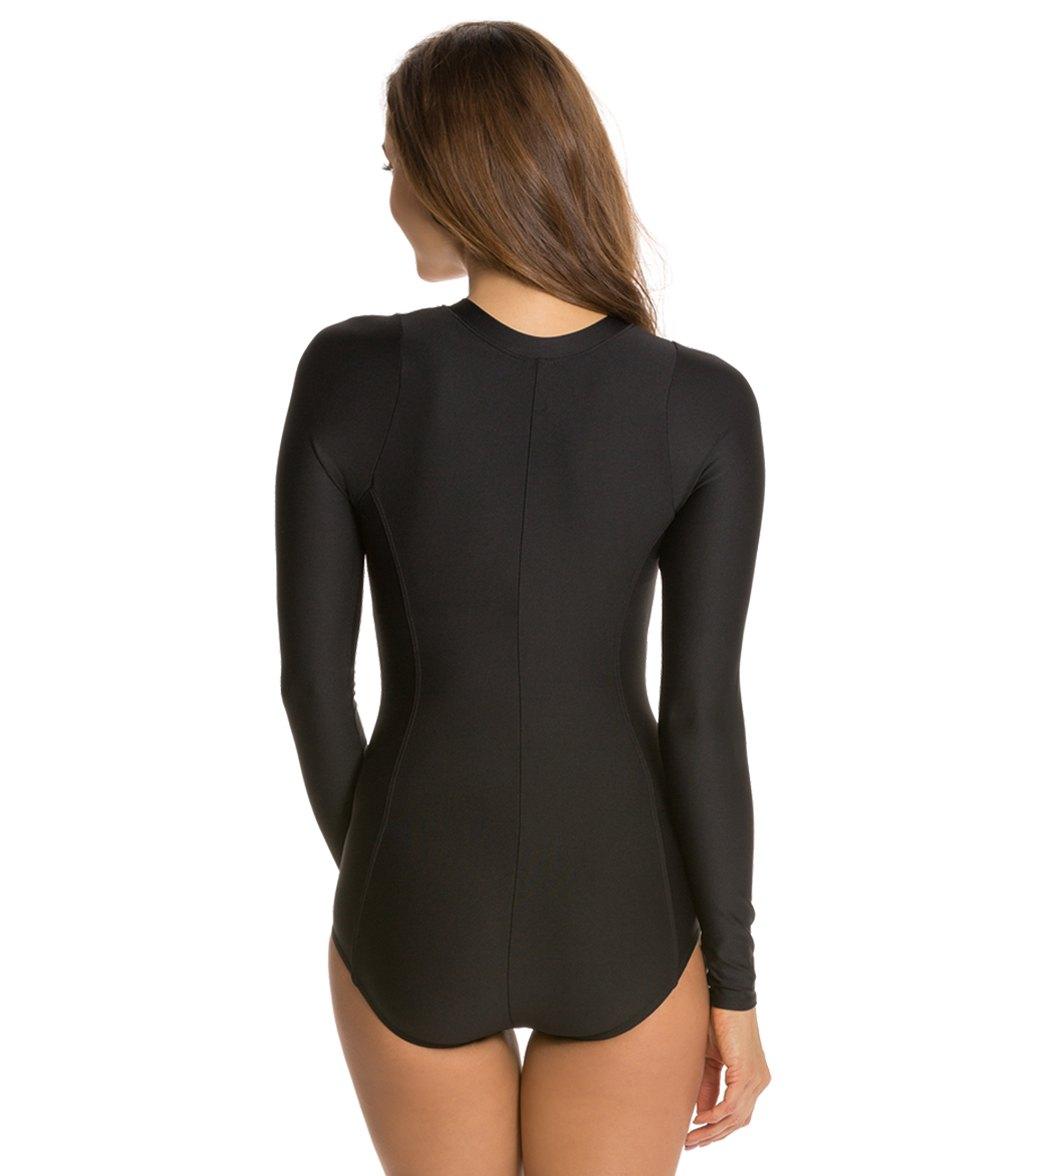 d3b6bca0cb Next Good Karma Solid Malibu Zip Long Sleeve One Piece Swimsuit at  SwimOutlet.com - Free Shipping